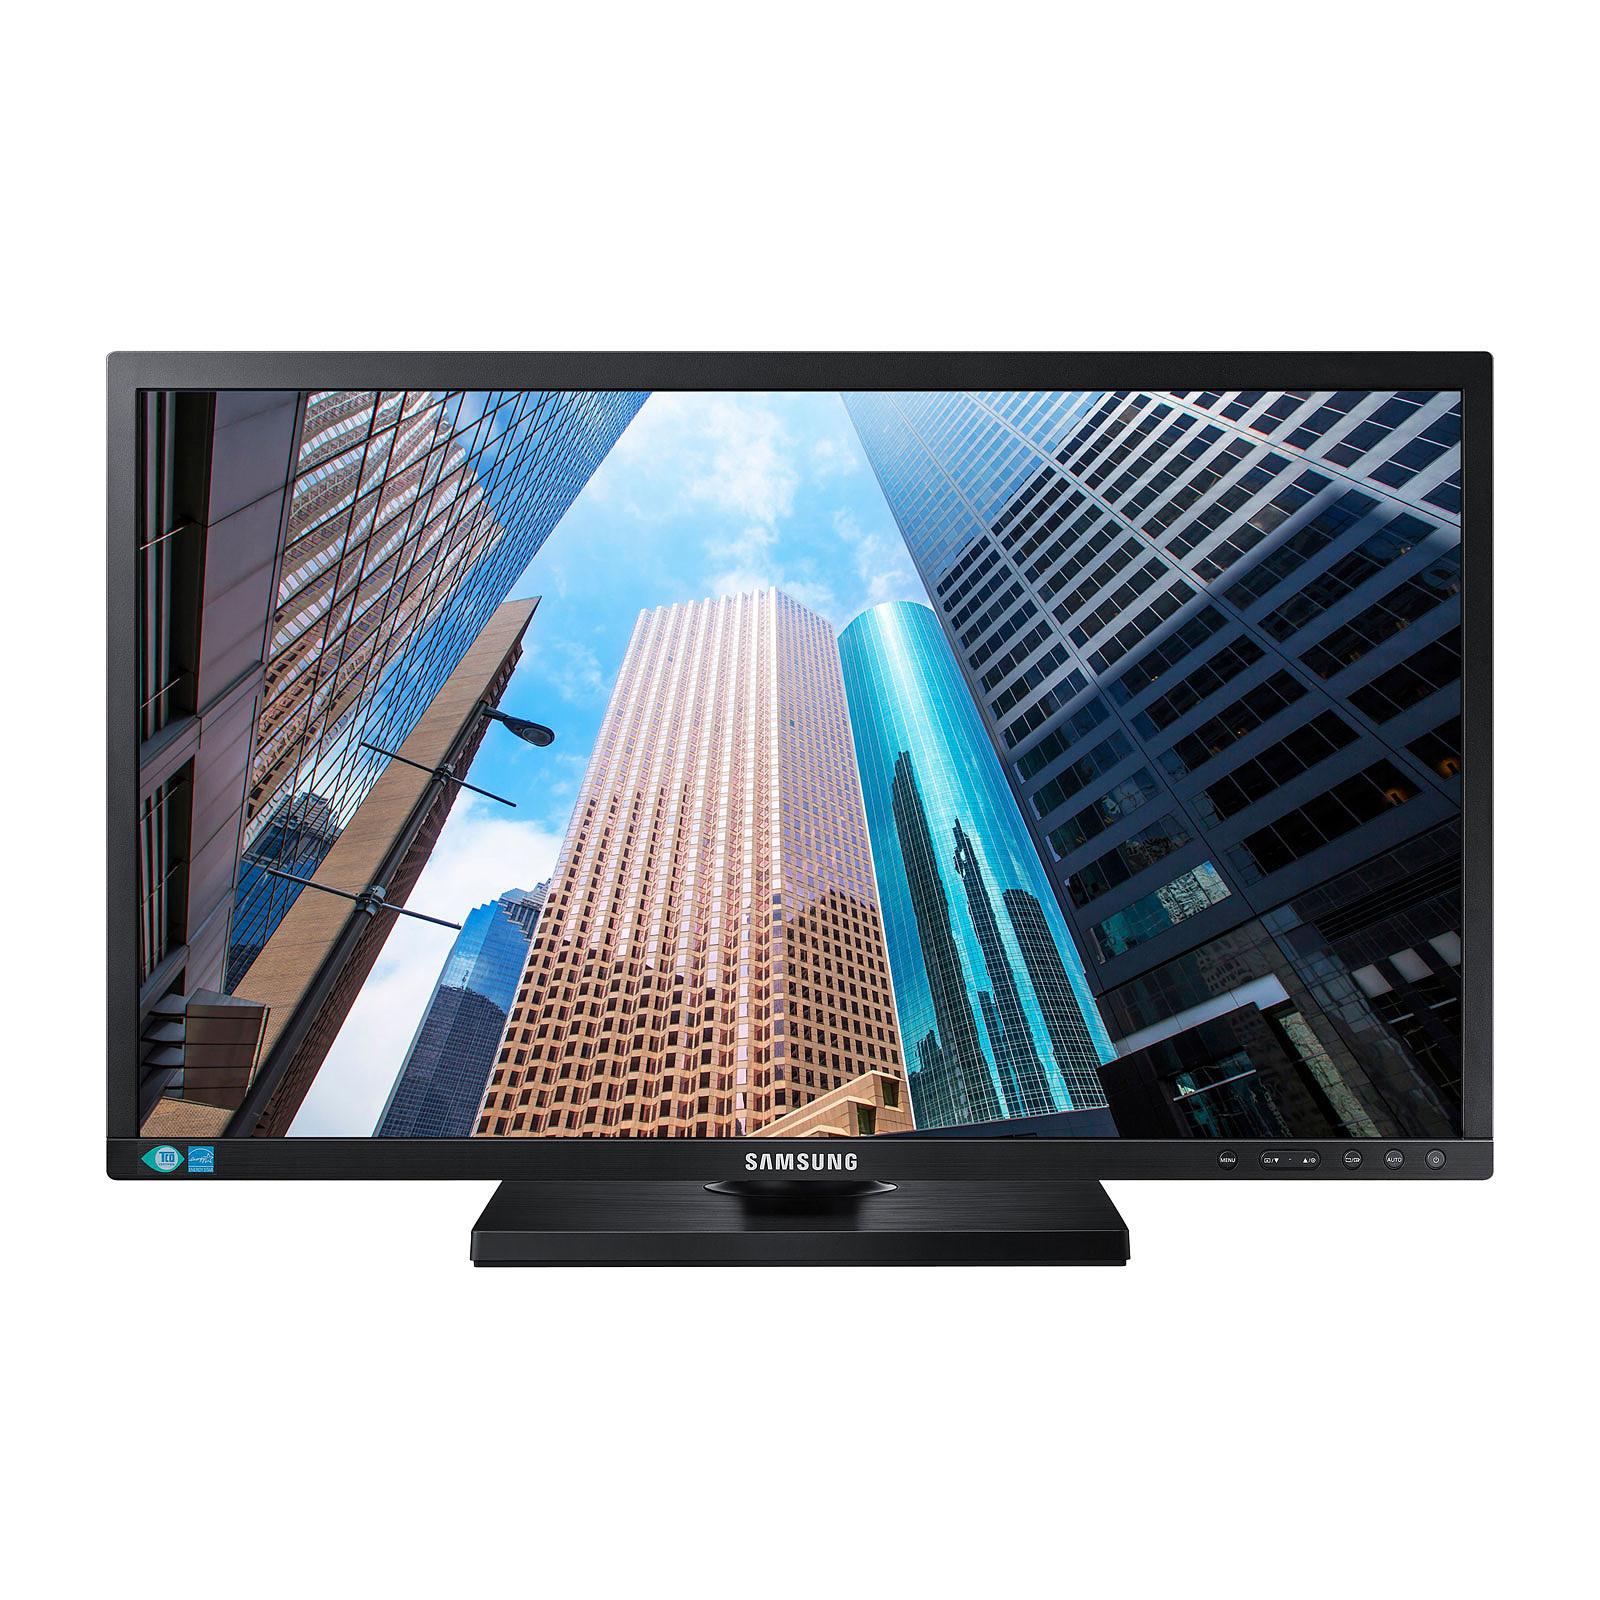 "Samsung 23.6"" LED - S24E650PLC"